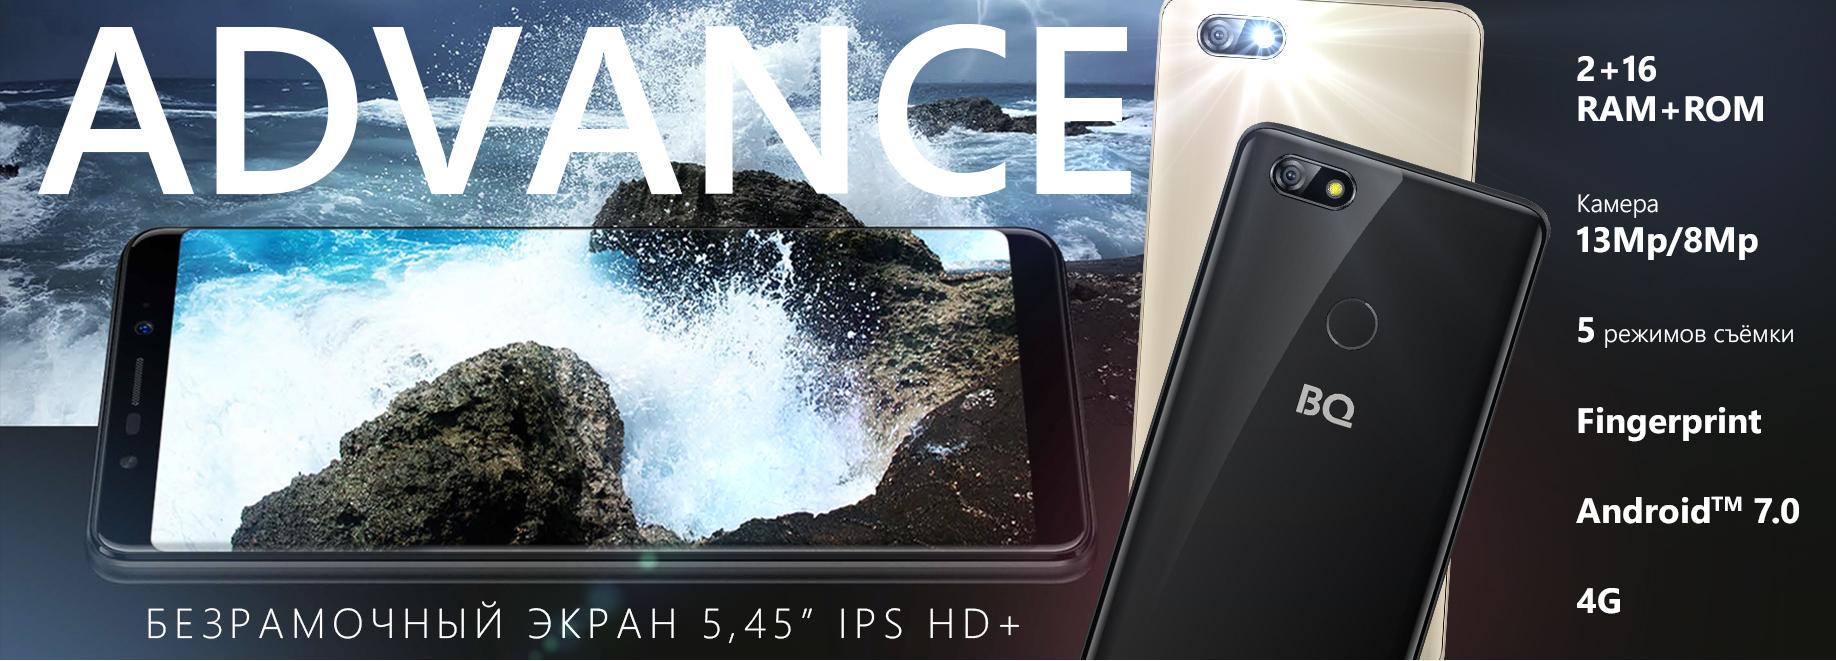 Новый смартфон BQ-5500 Advance